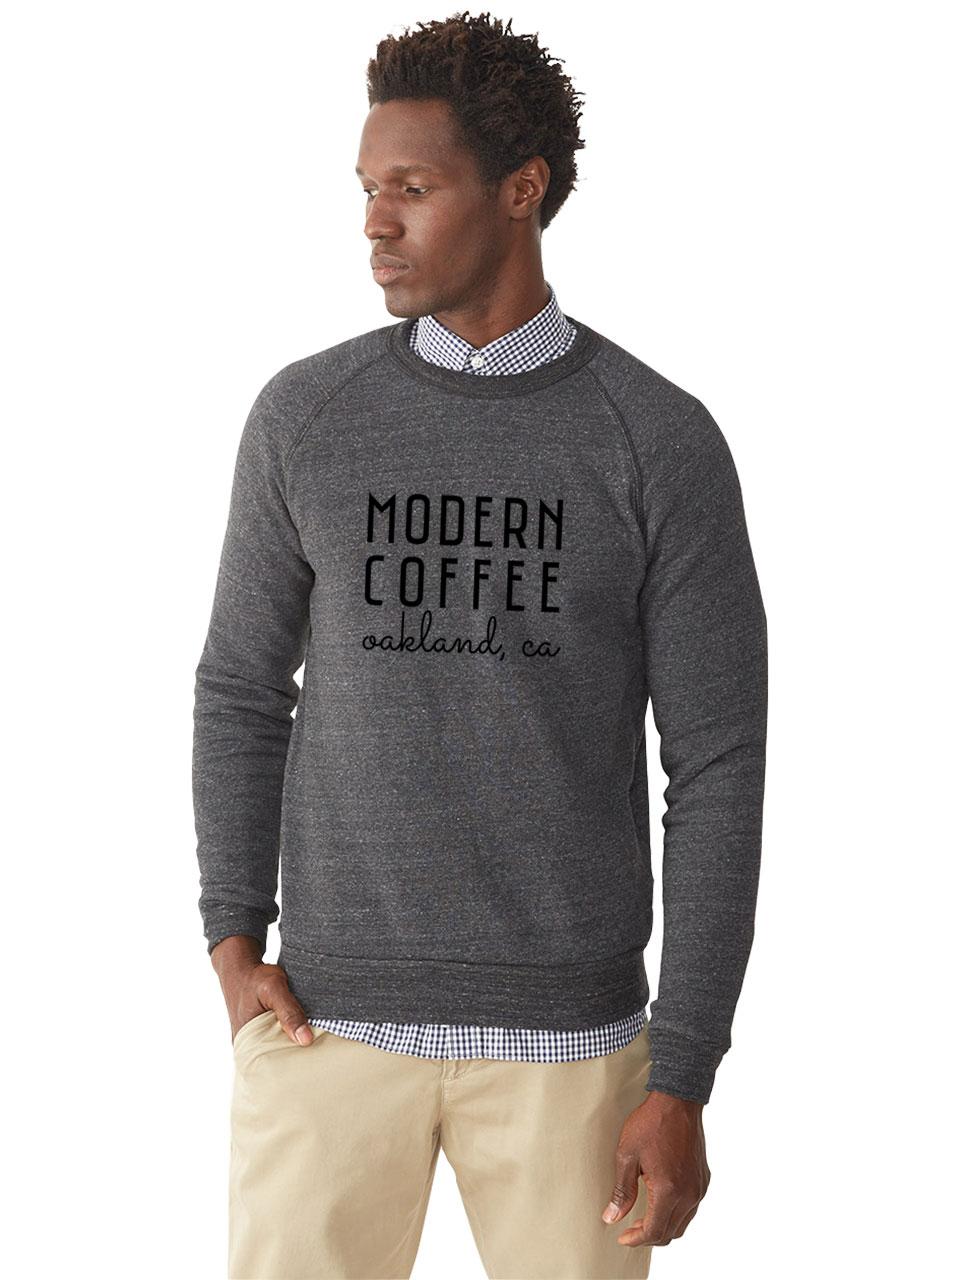 sweatshirt_mockup-R3-D-black